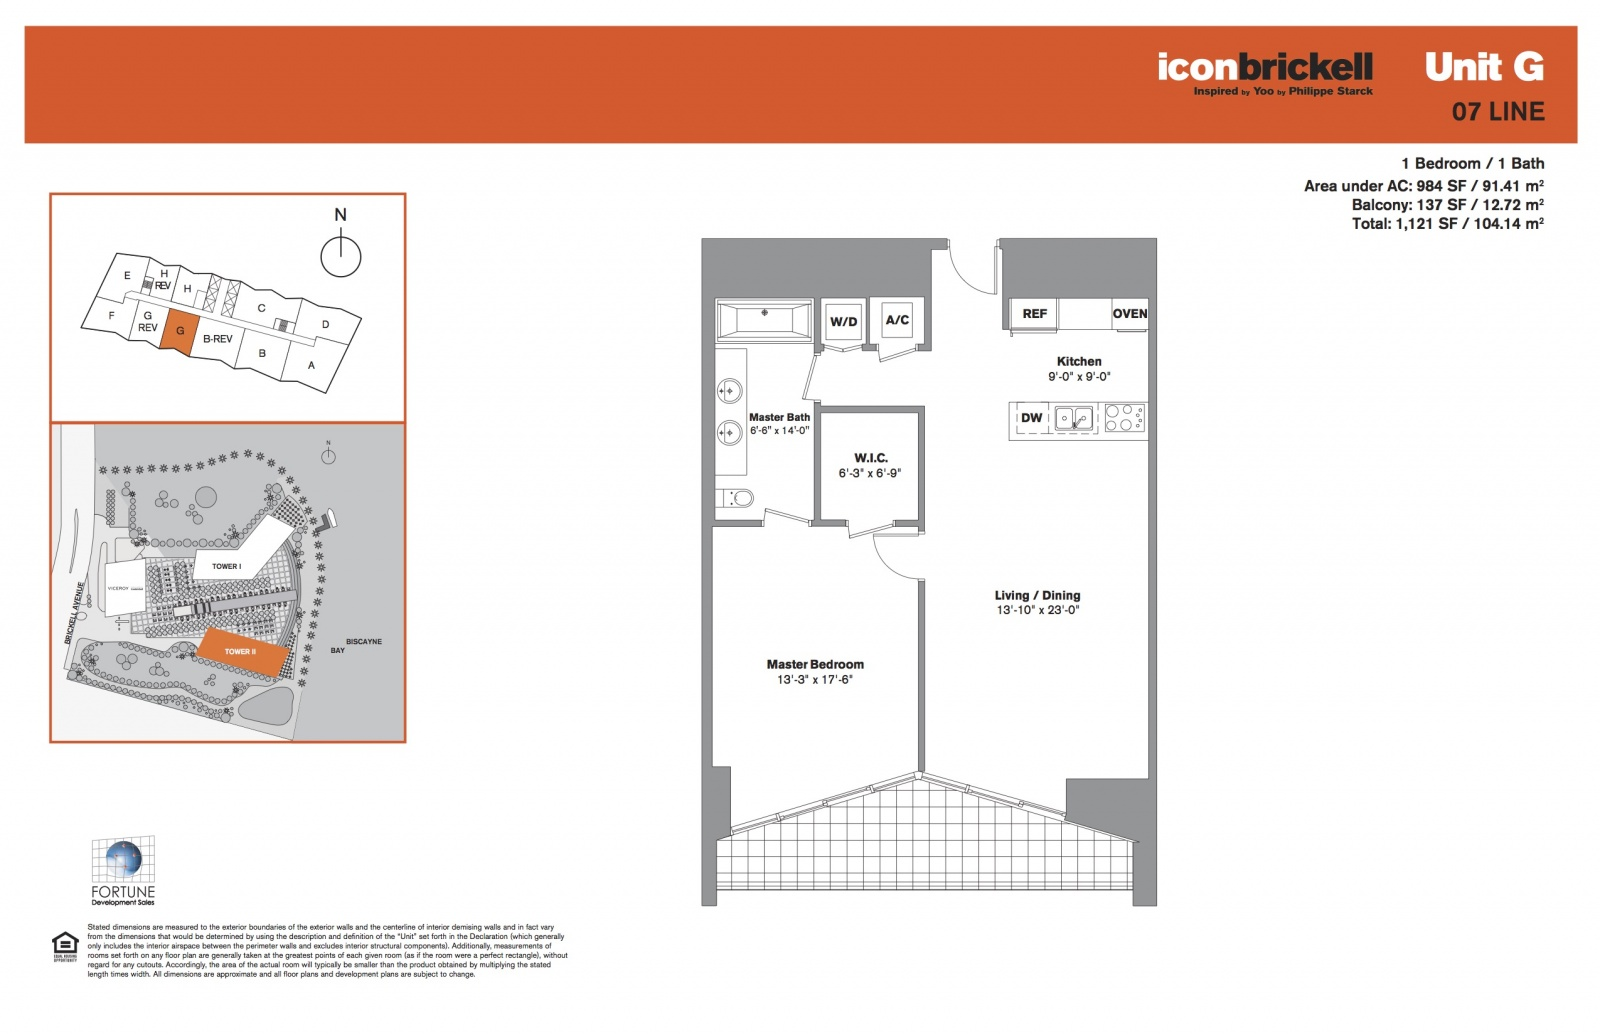 Icon Brickell Two, line 07 floor plan